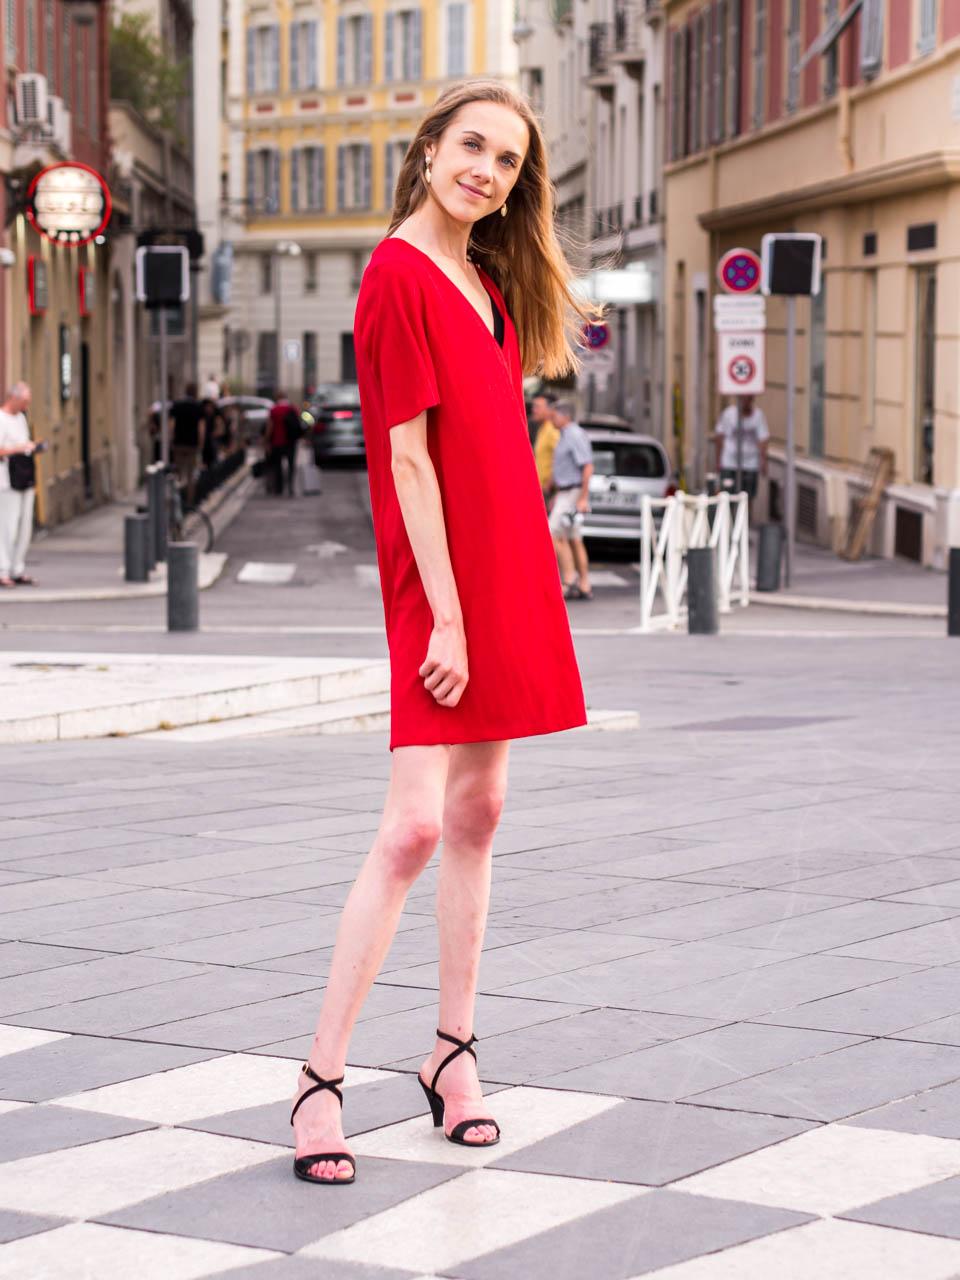 Fashion blogger second hand shopping finds - Muotibloggaaja, second hand, kirpputorilöydöt